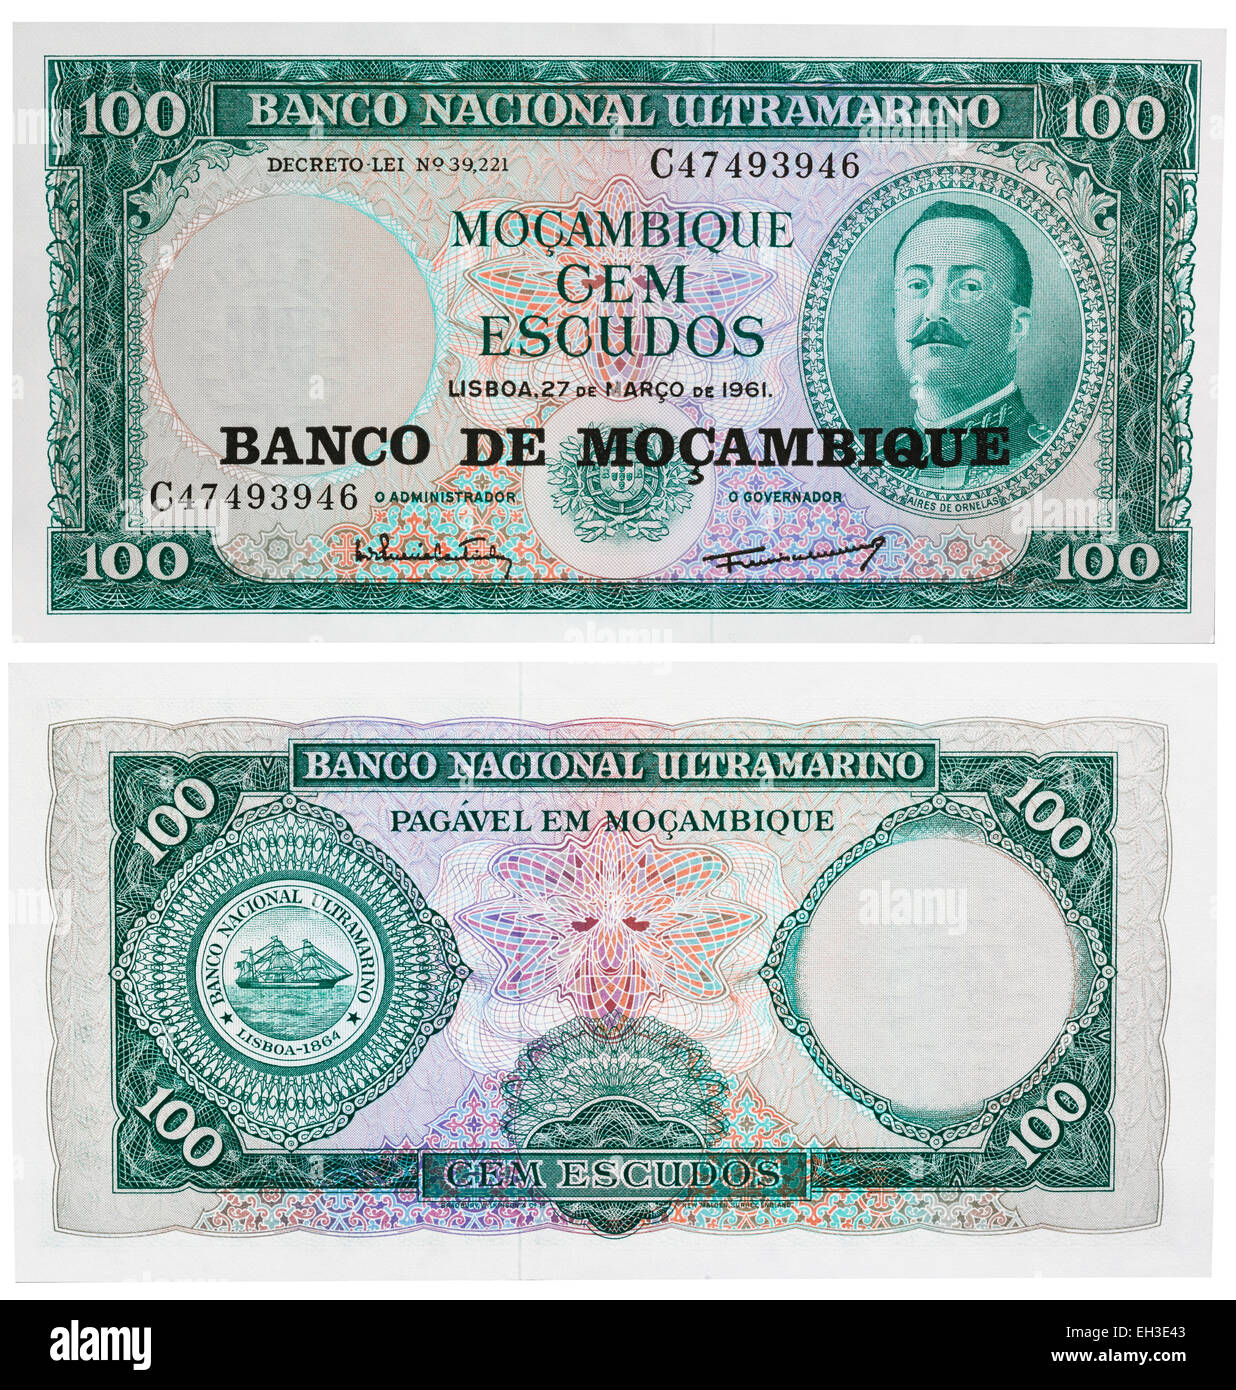 100 escudos banknote, Aires de Ornelas, Mozambique, 1961 - Stock Image